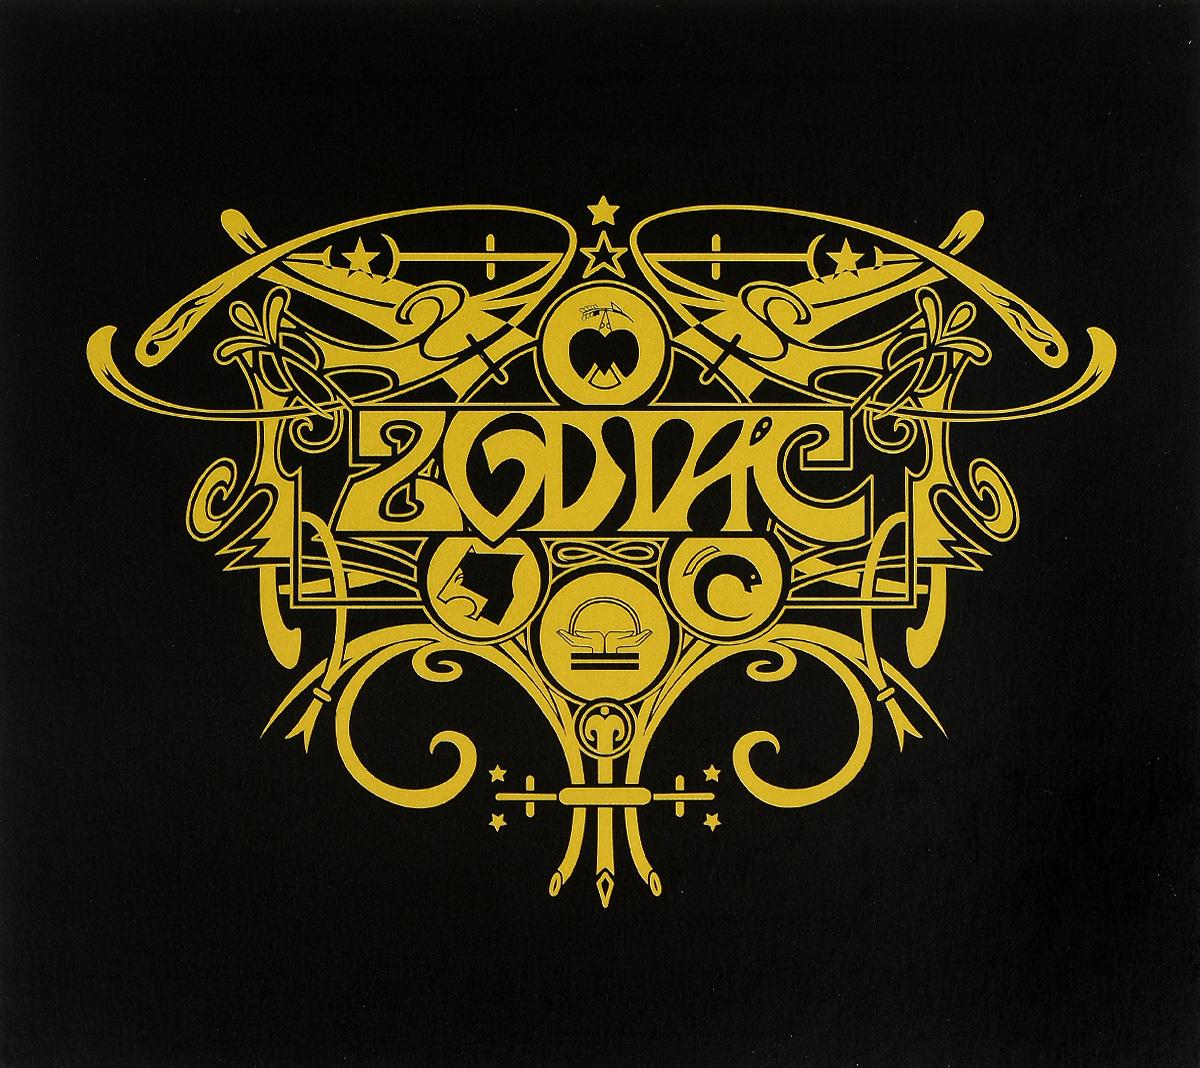 Zodiac Zodiac. Zodiac ac usb 3xaaa powered multicolored whirling crystal zodiac decoration lamp virgo